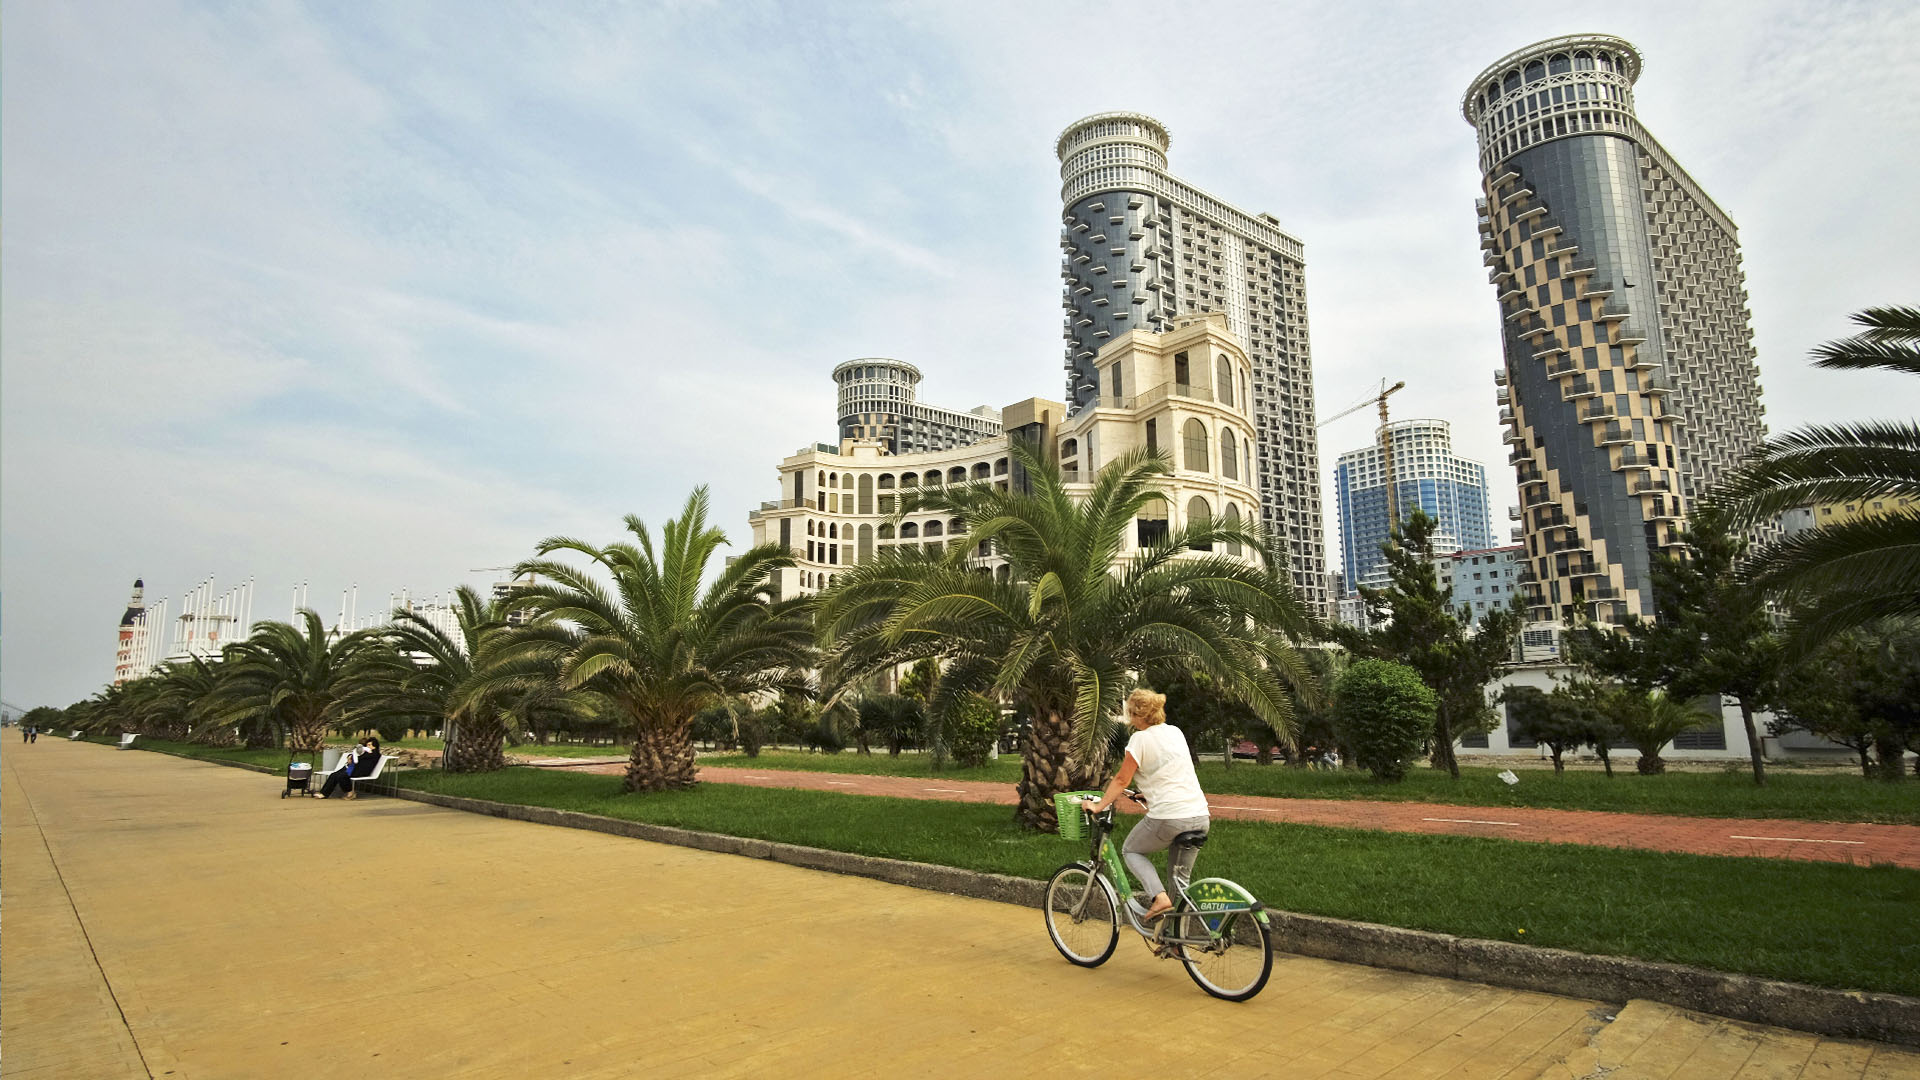 Бульвар Батуми, отели и велосипедист